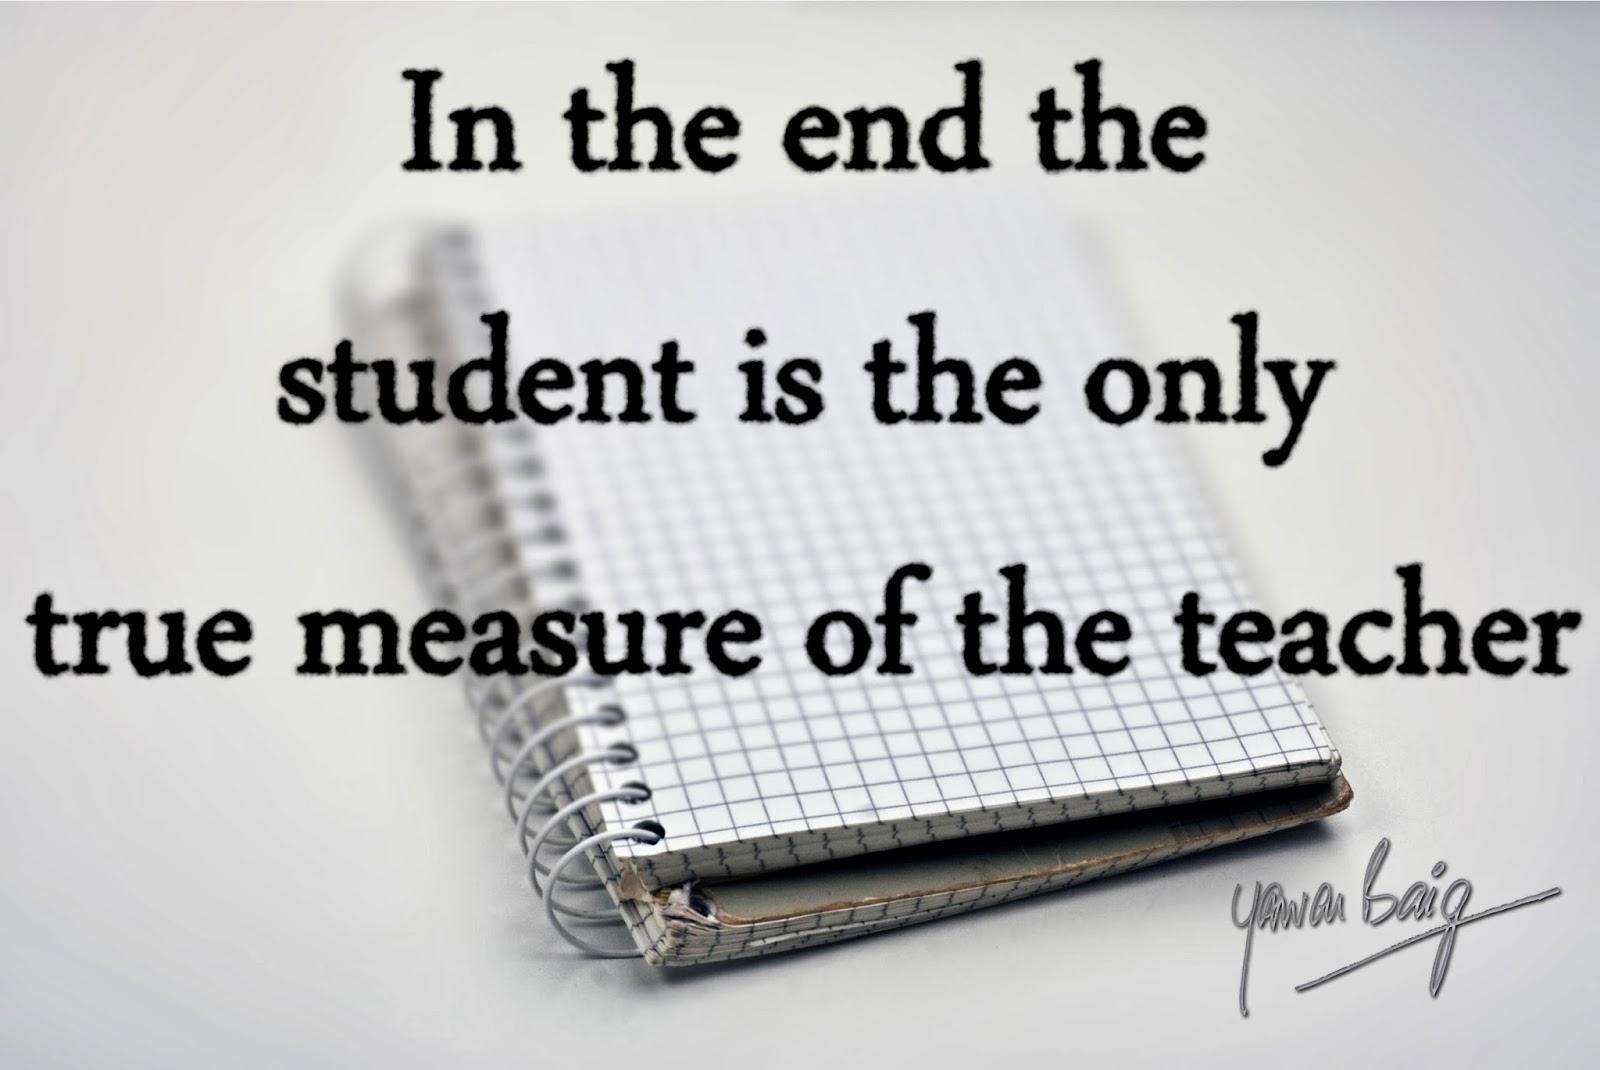 O! Teacher, stop teaching